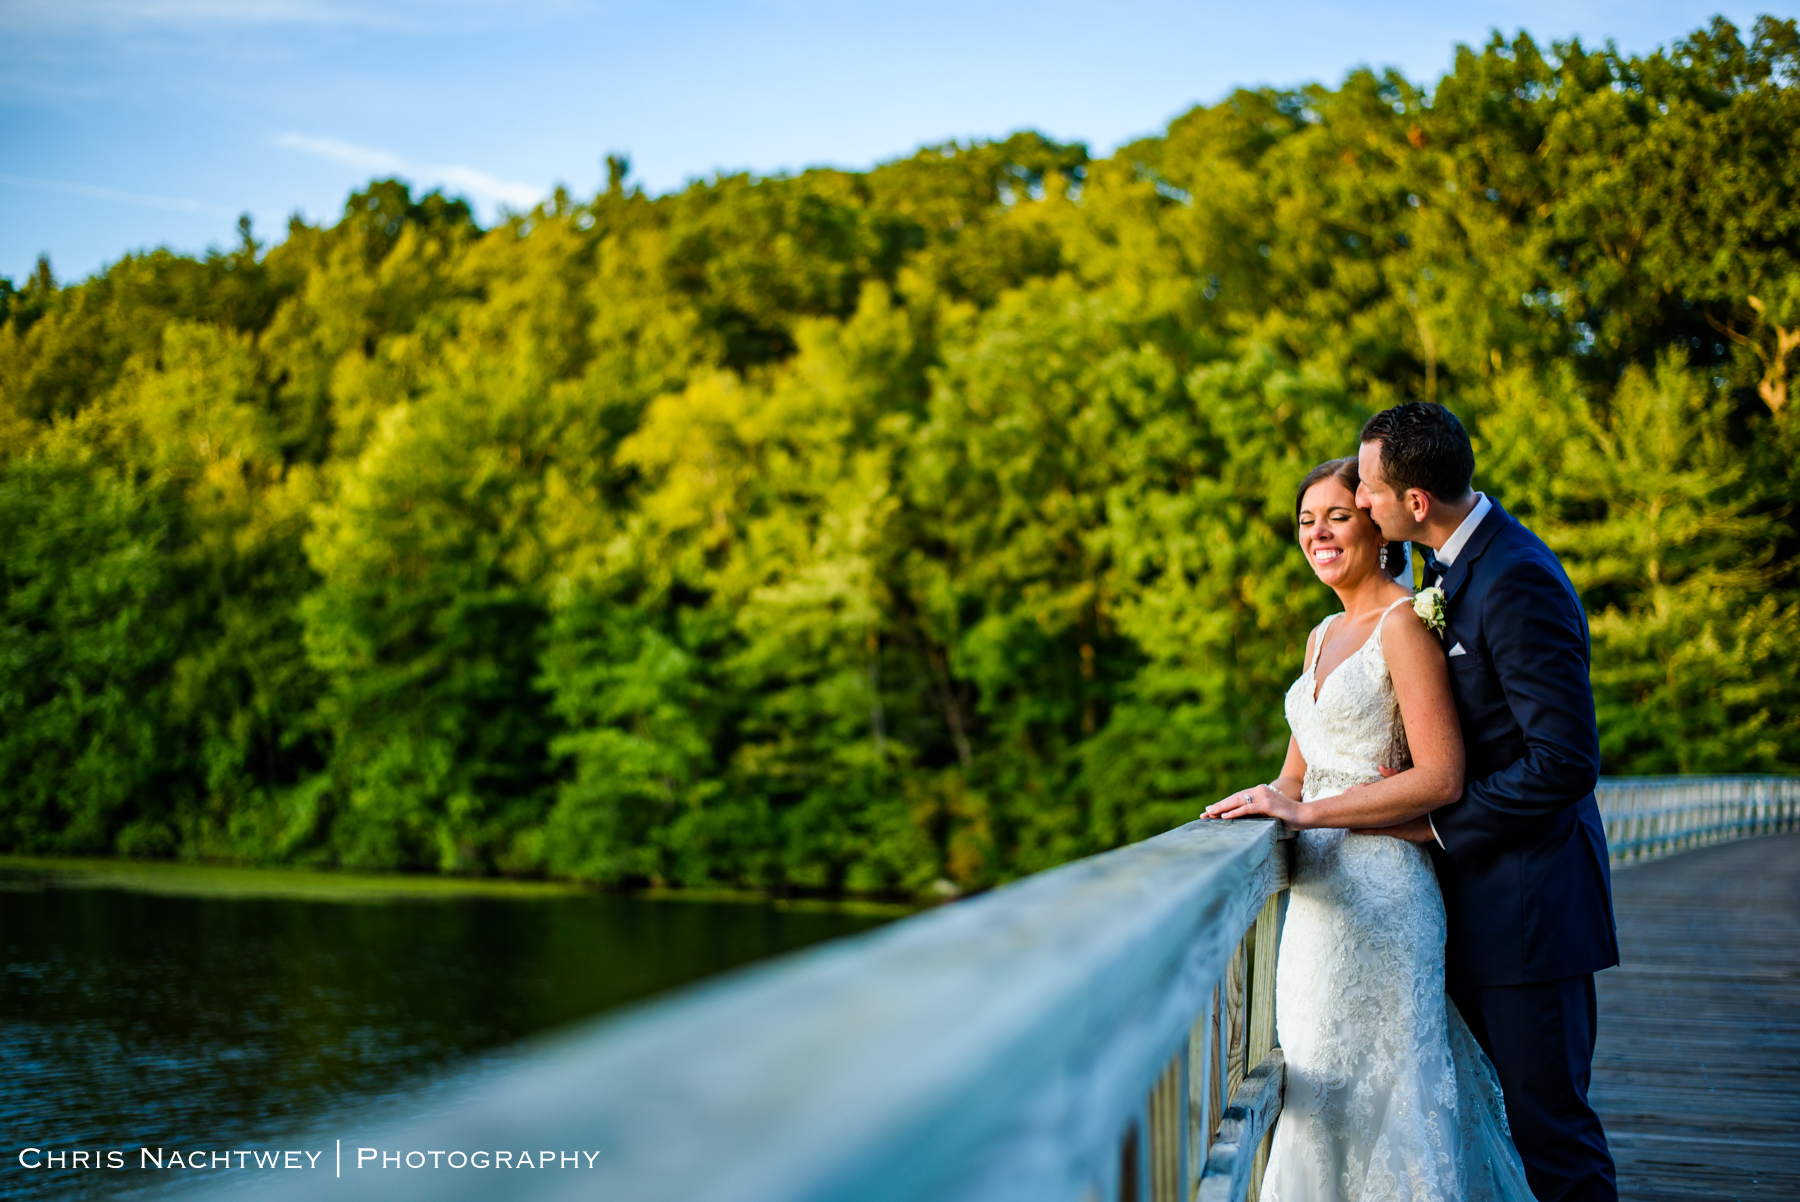 wedding-lake-of-isles-photos-chris-nachtwey-photography-2019-42.jpg